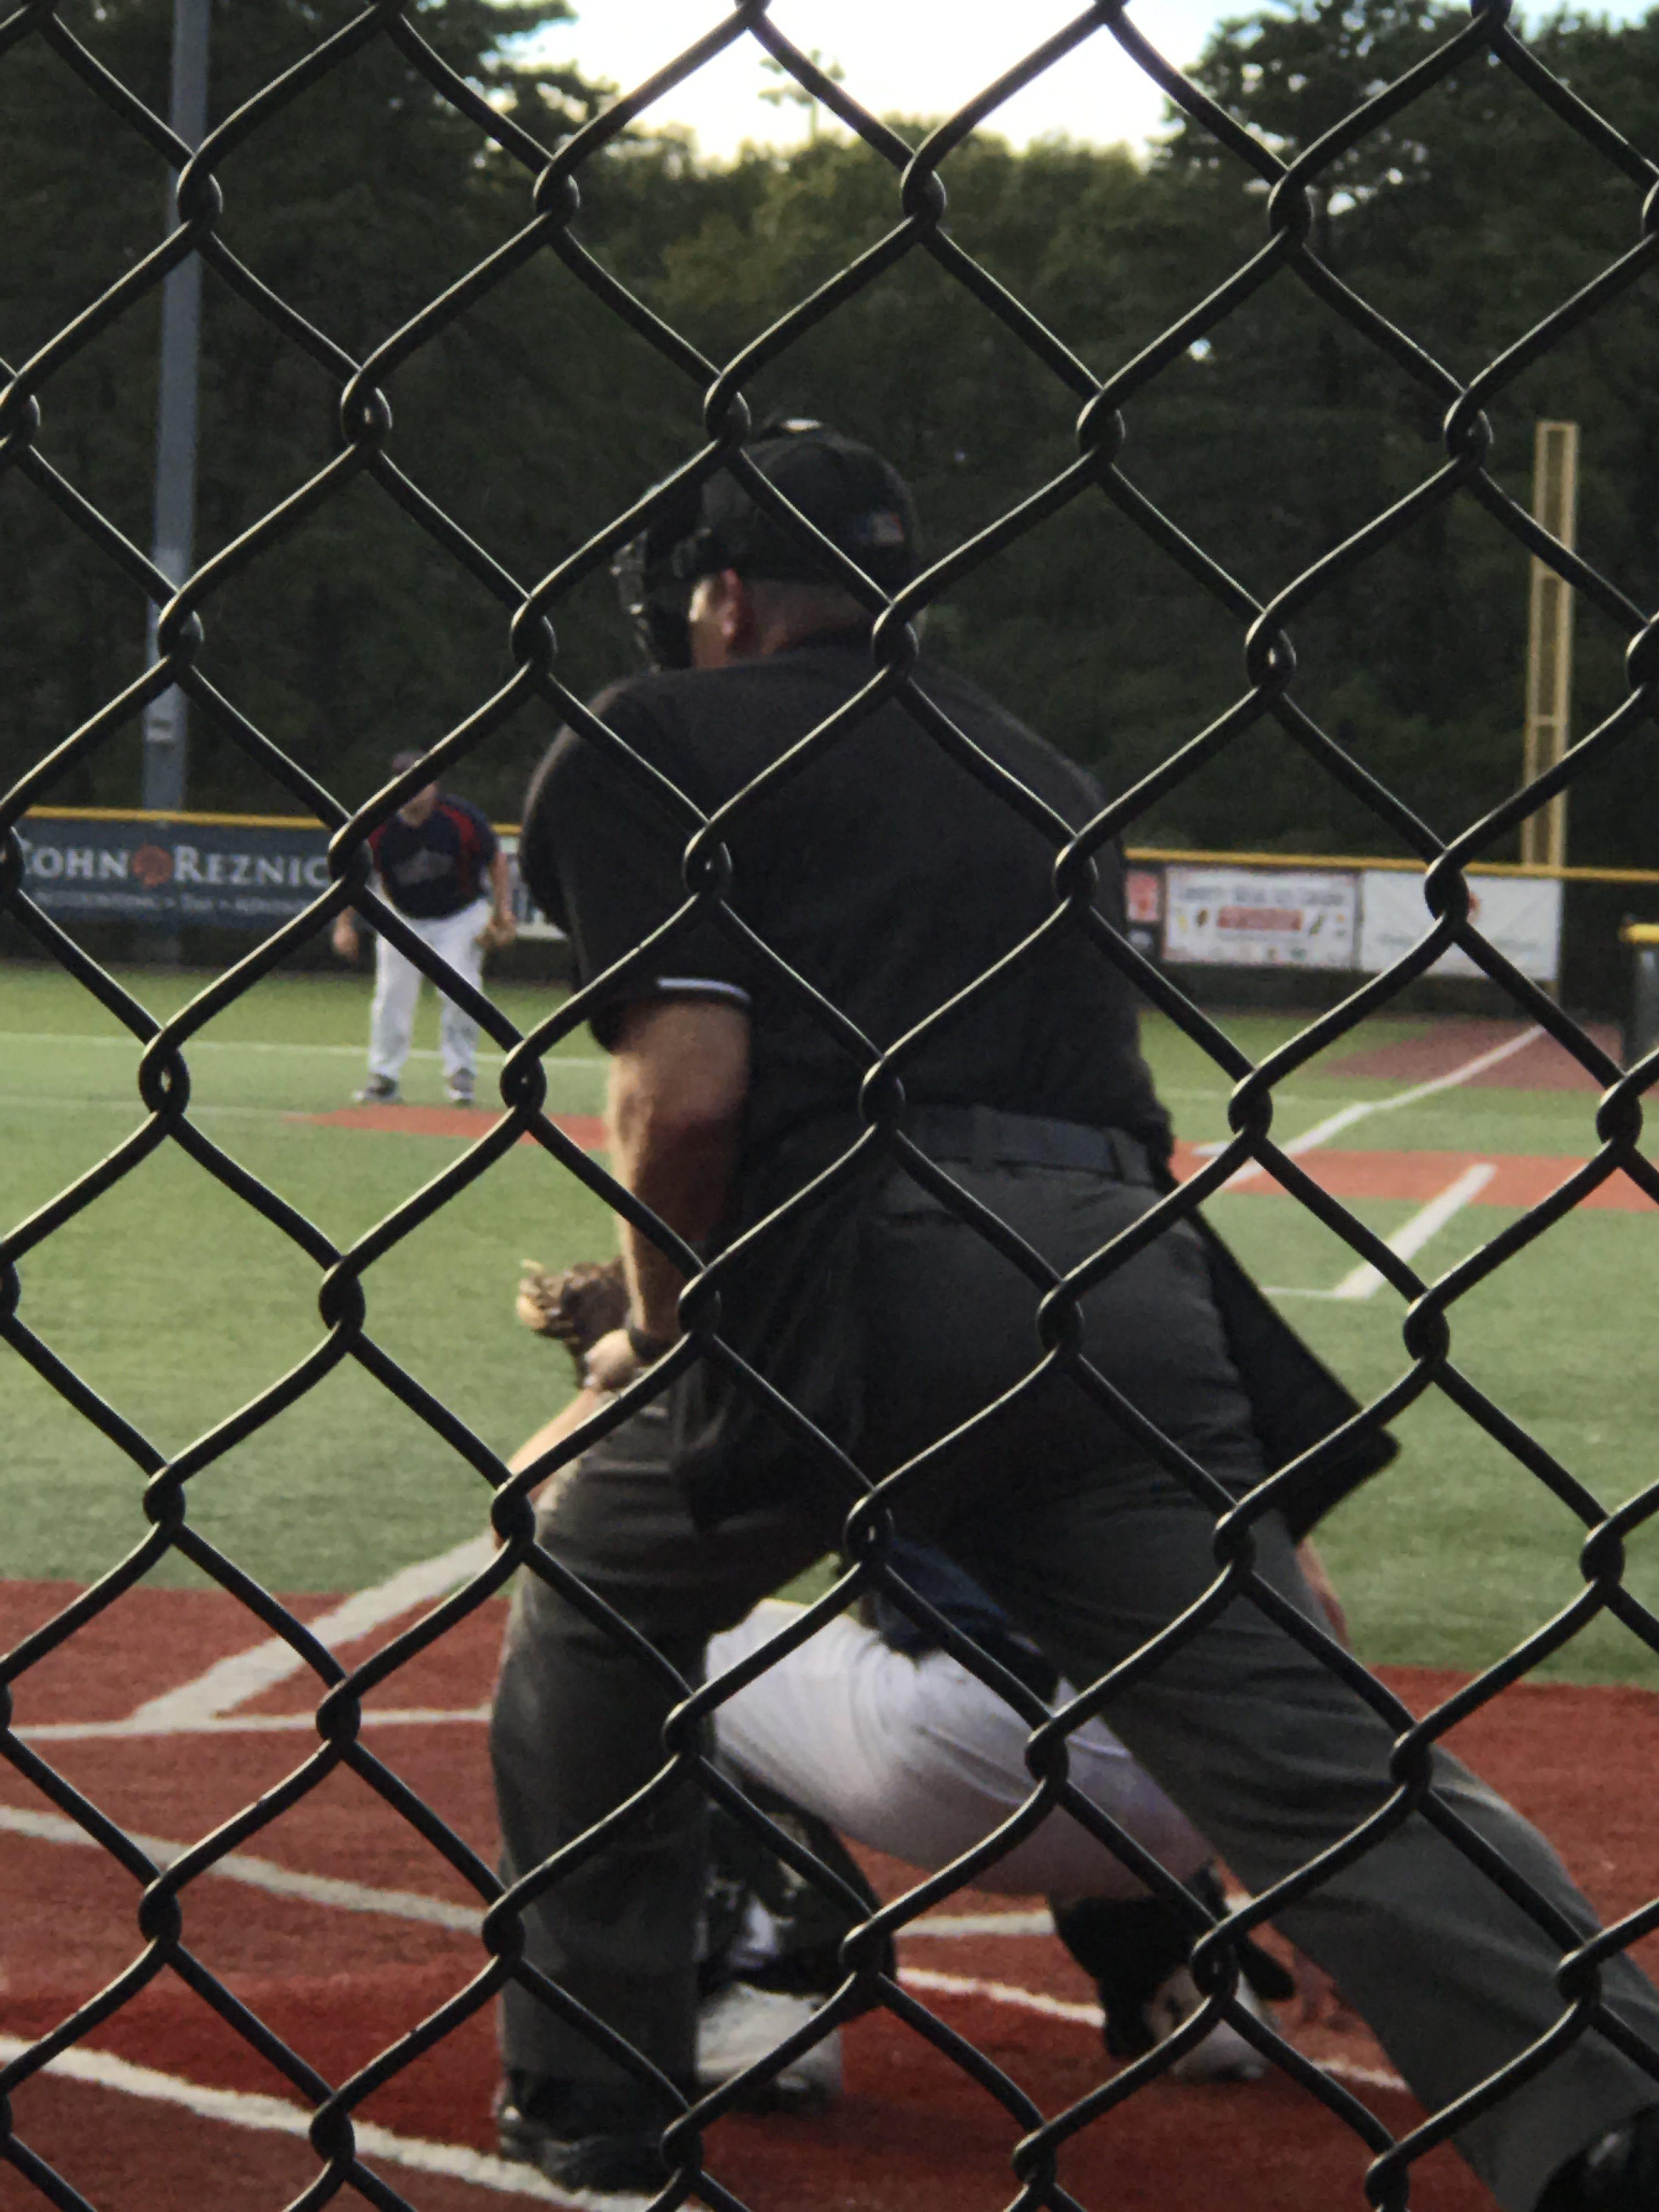 CBUAO/ECUA 2 and 3 Man Camp @ Baseball Heaven